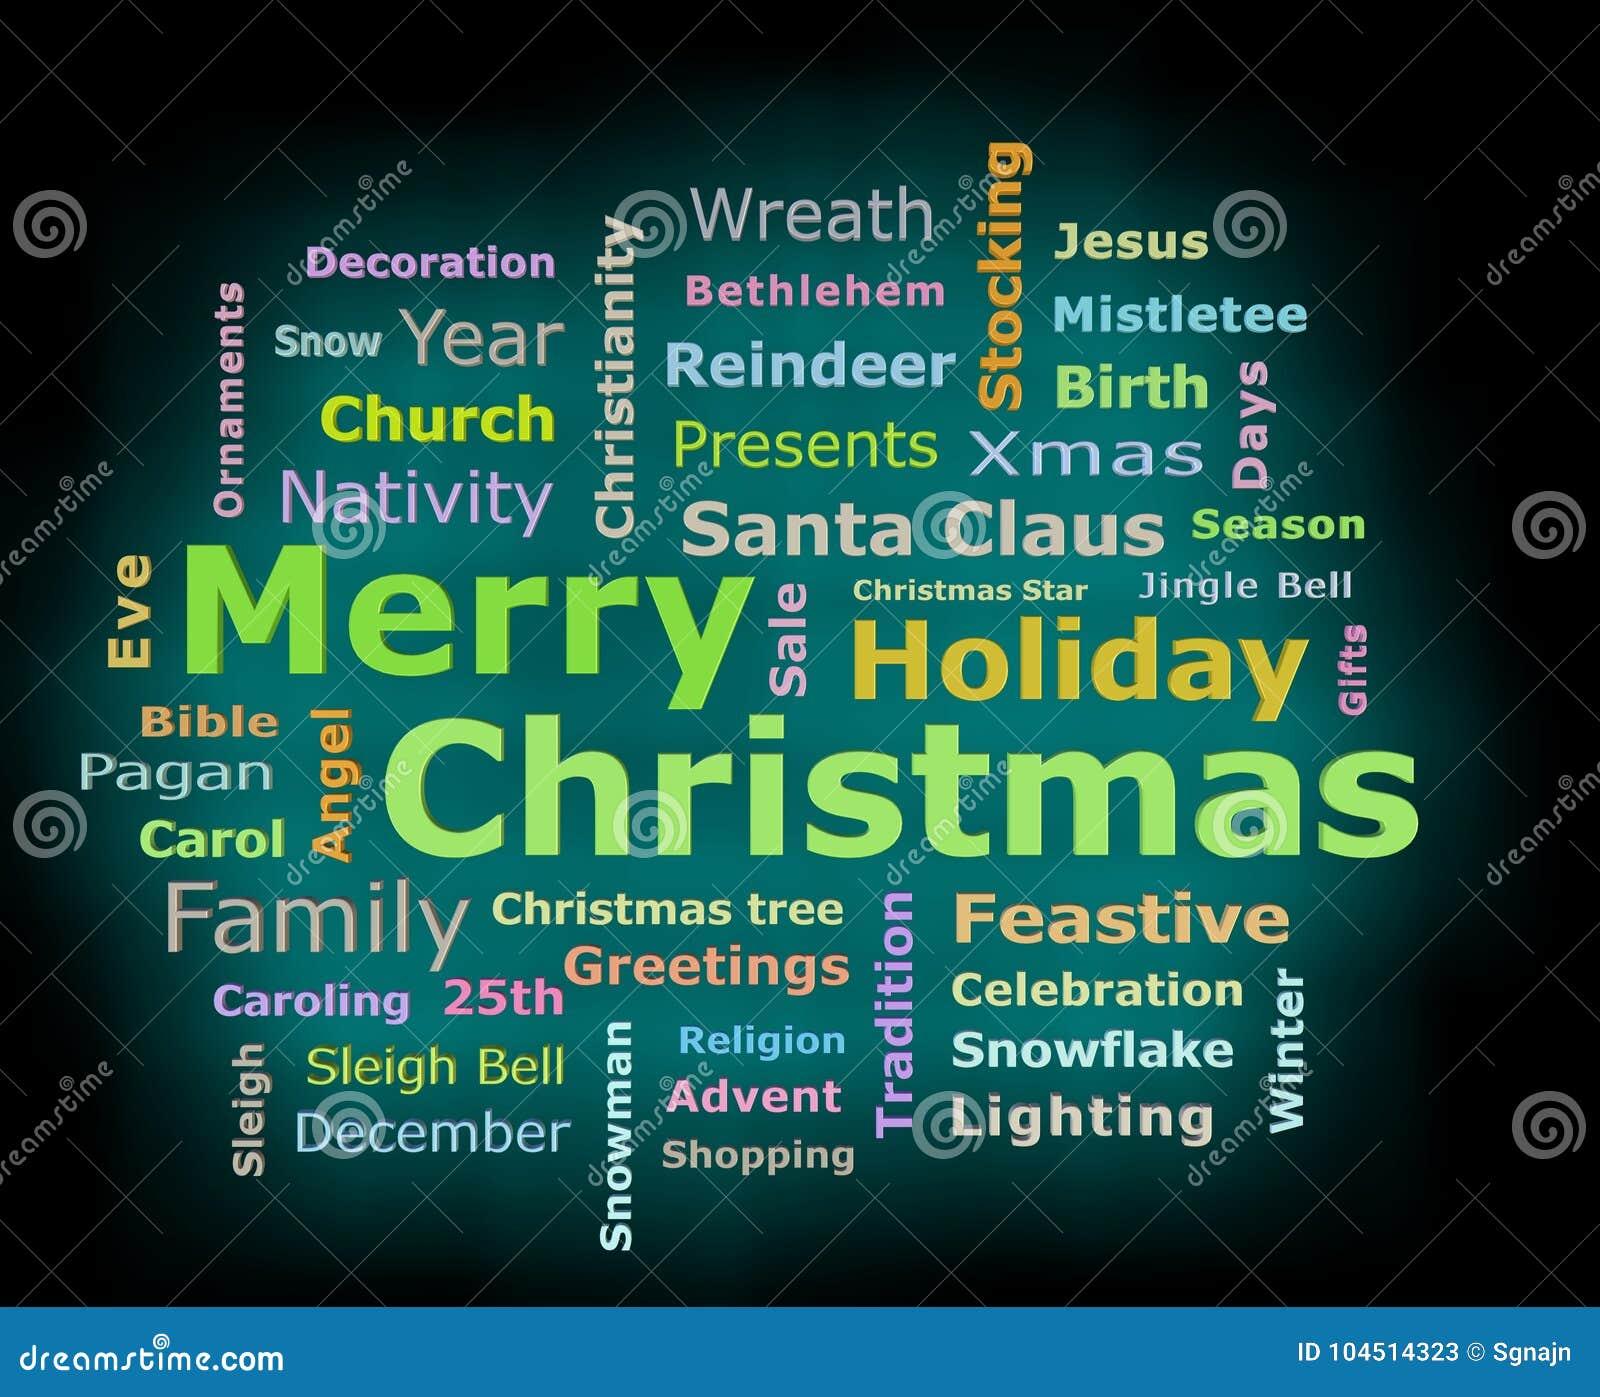 Merry Christmas Cyan Glow 3d Texts Greetings Word Cloud Stock